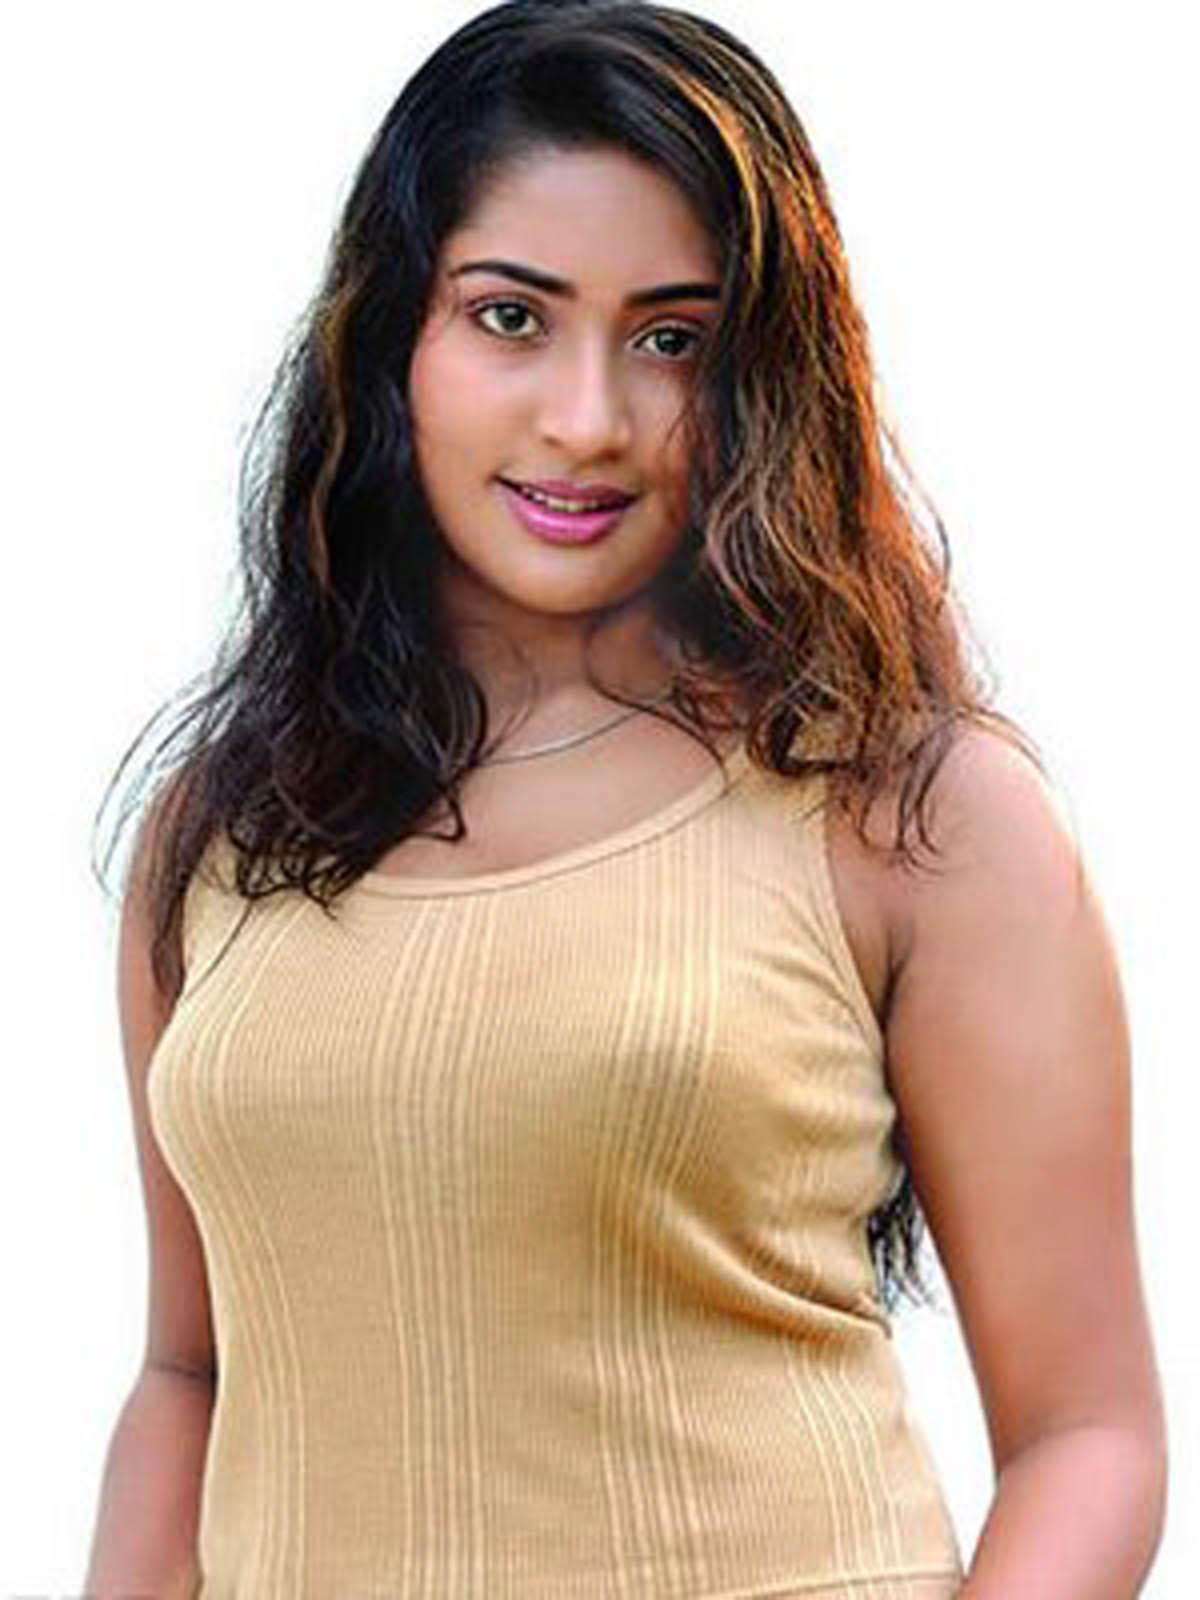 Xxx 50 Kriti Sanon Nude Photos Naked Sex Pics Porn Images   adanih.com